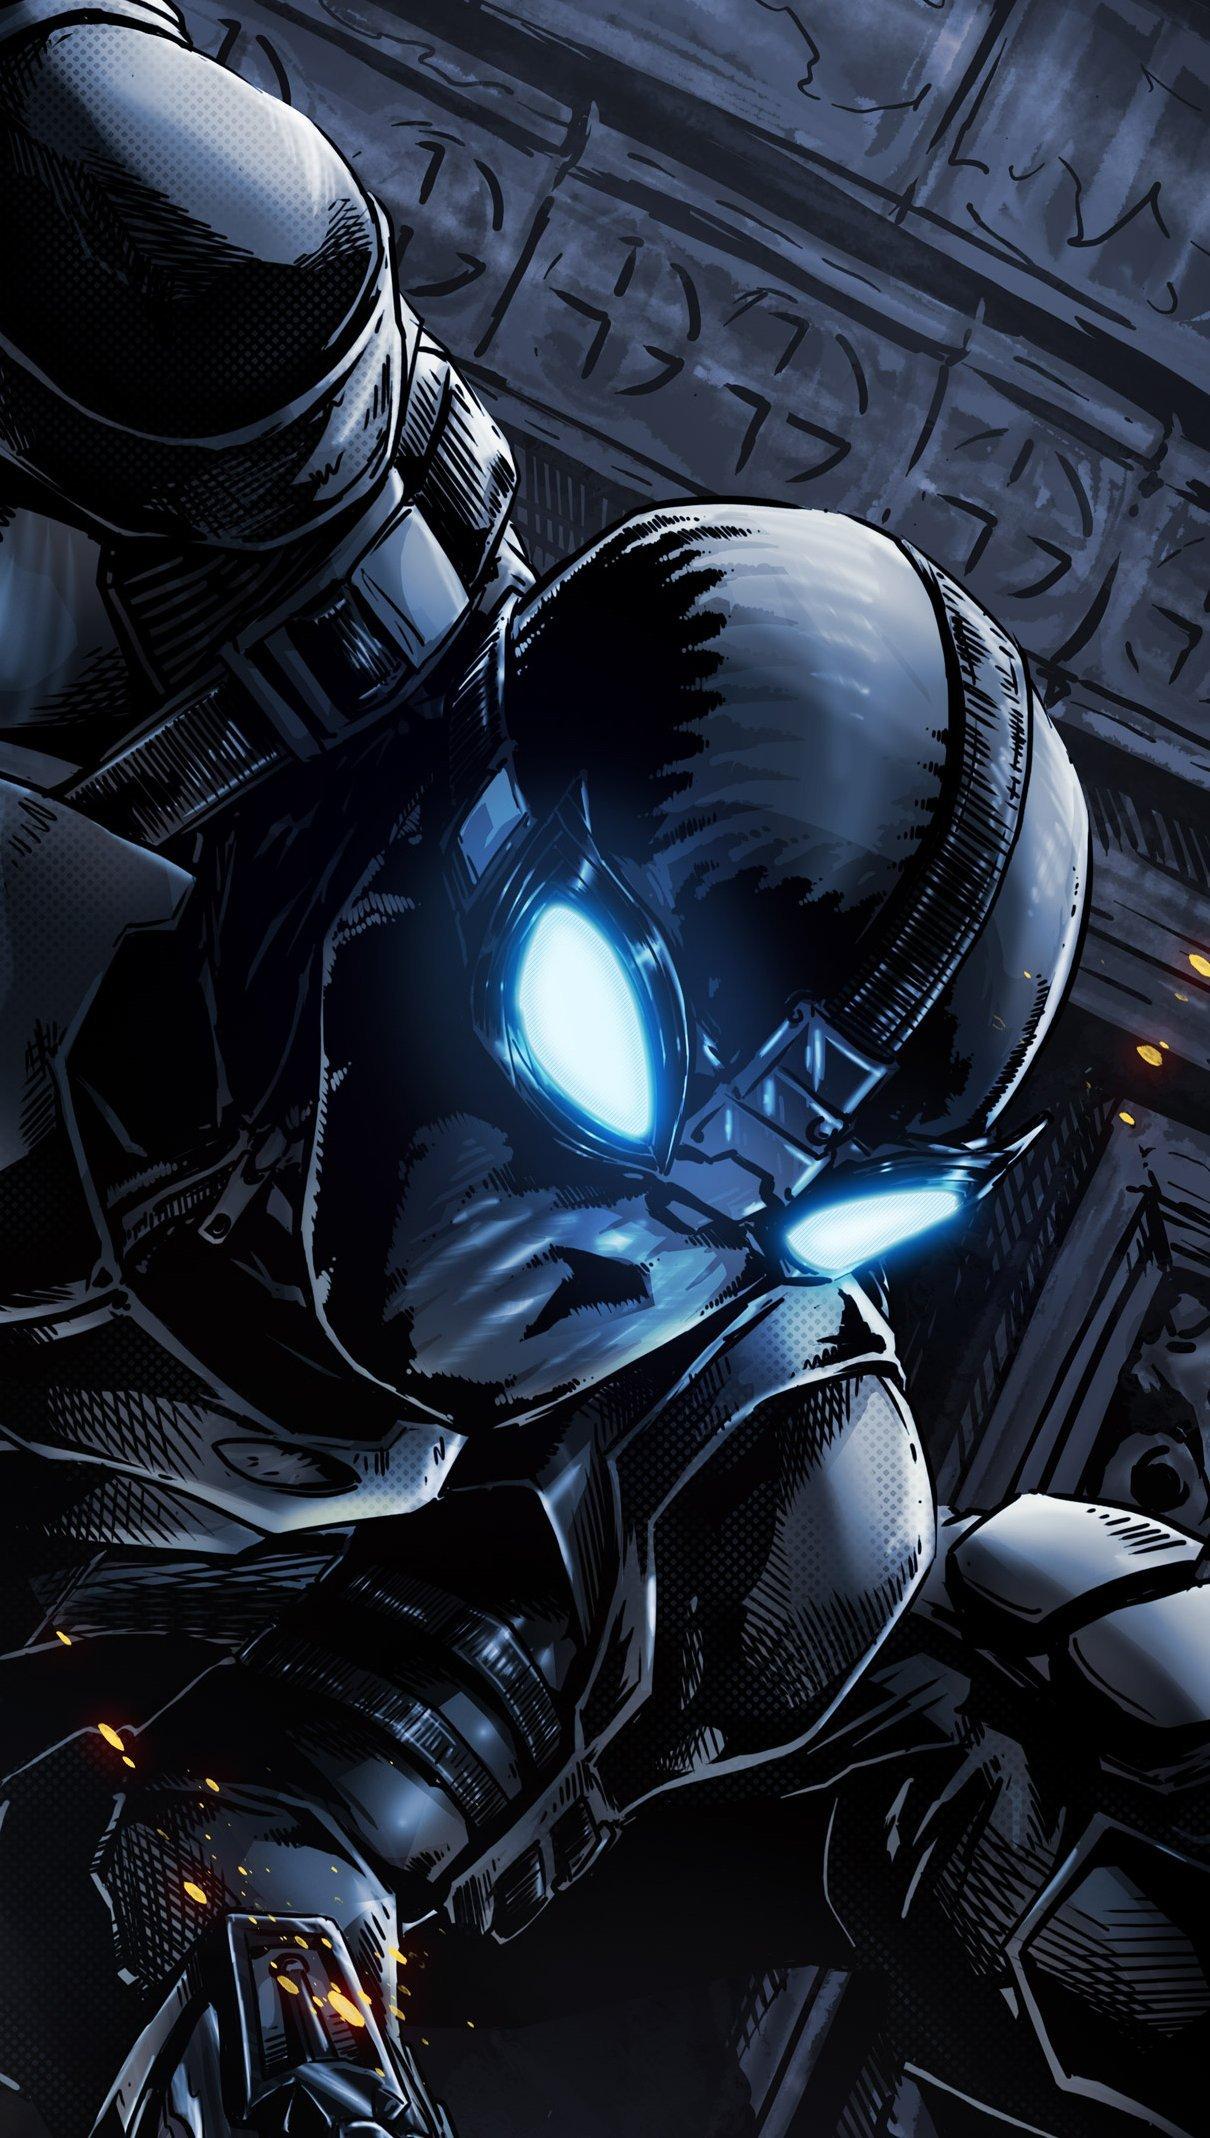 Wallpaper Spiderman with black suit Vertical